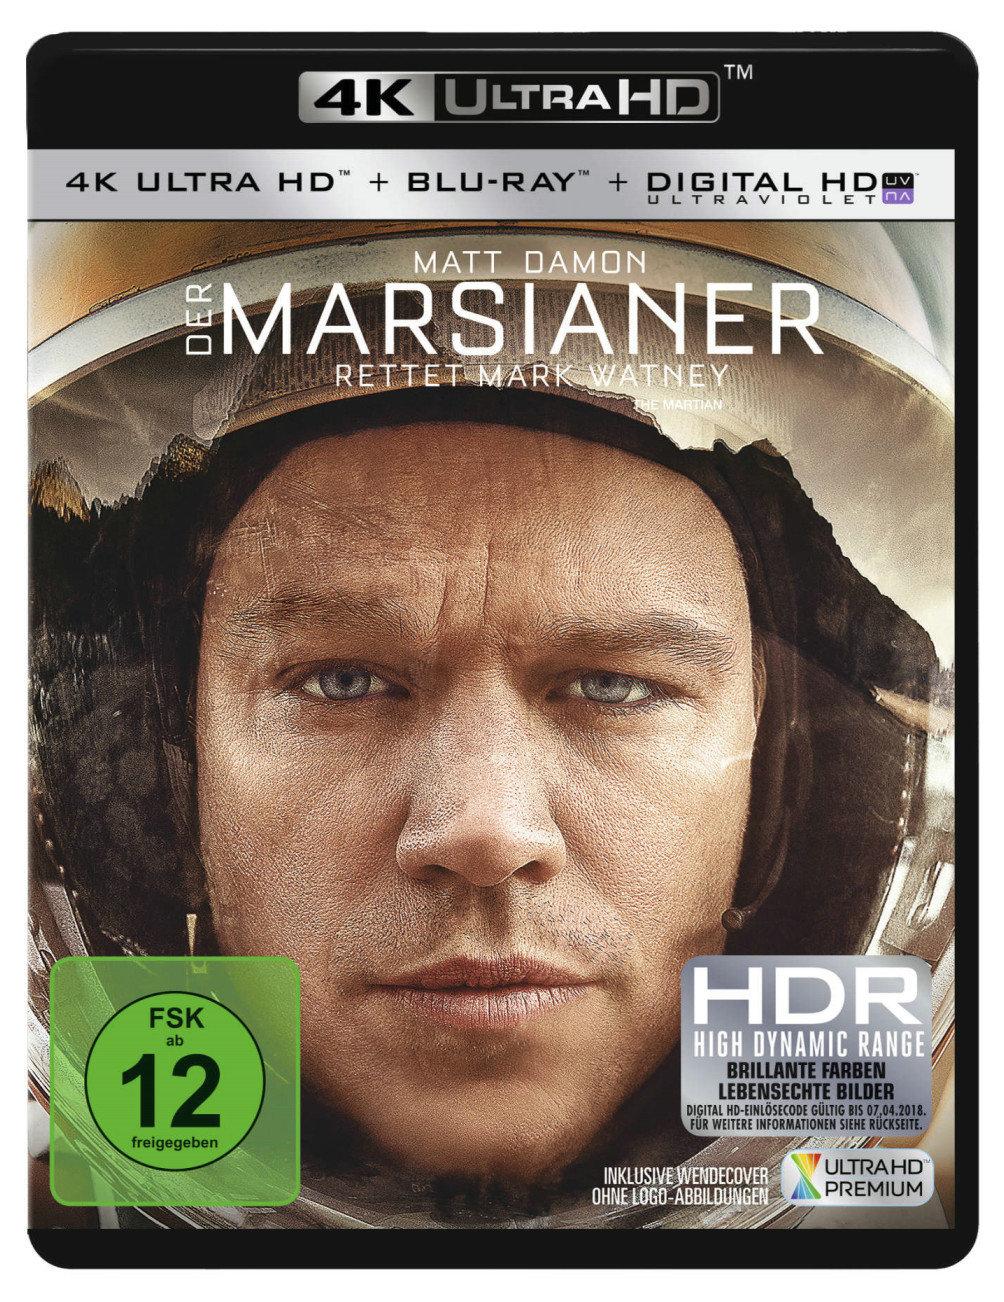 Der Marsianer - Rettet Mark Watney 4K (2015) - (4K Ultra HD & Blu-ray)